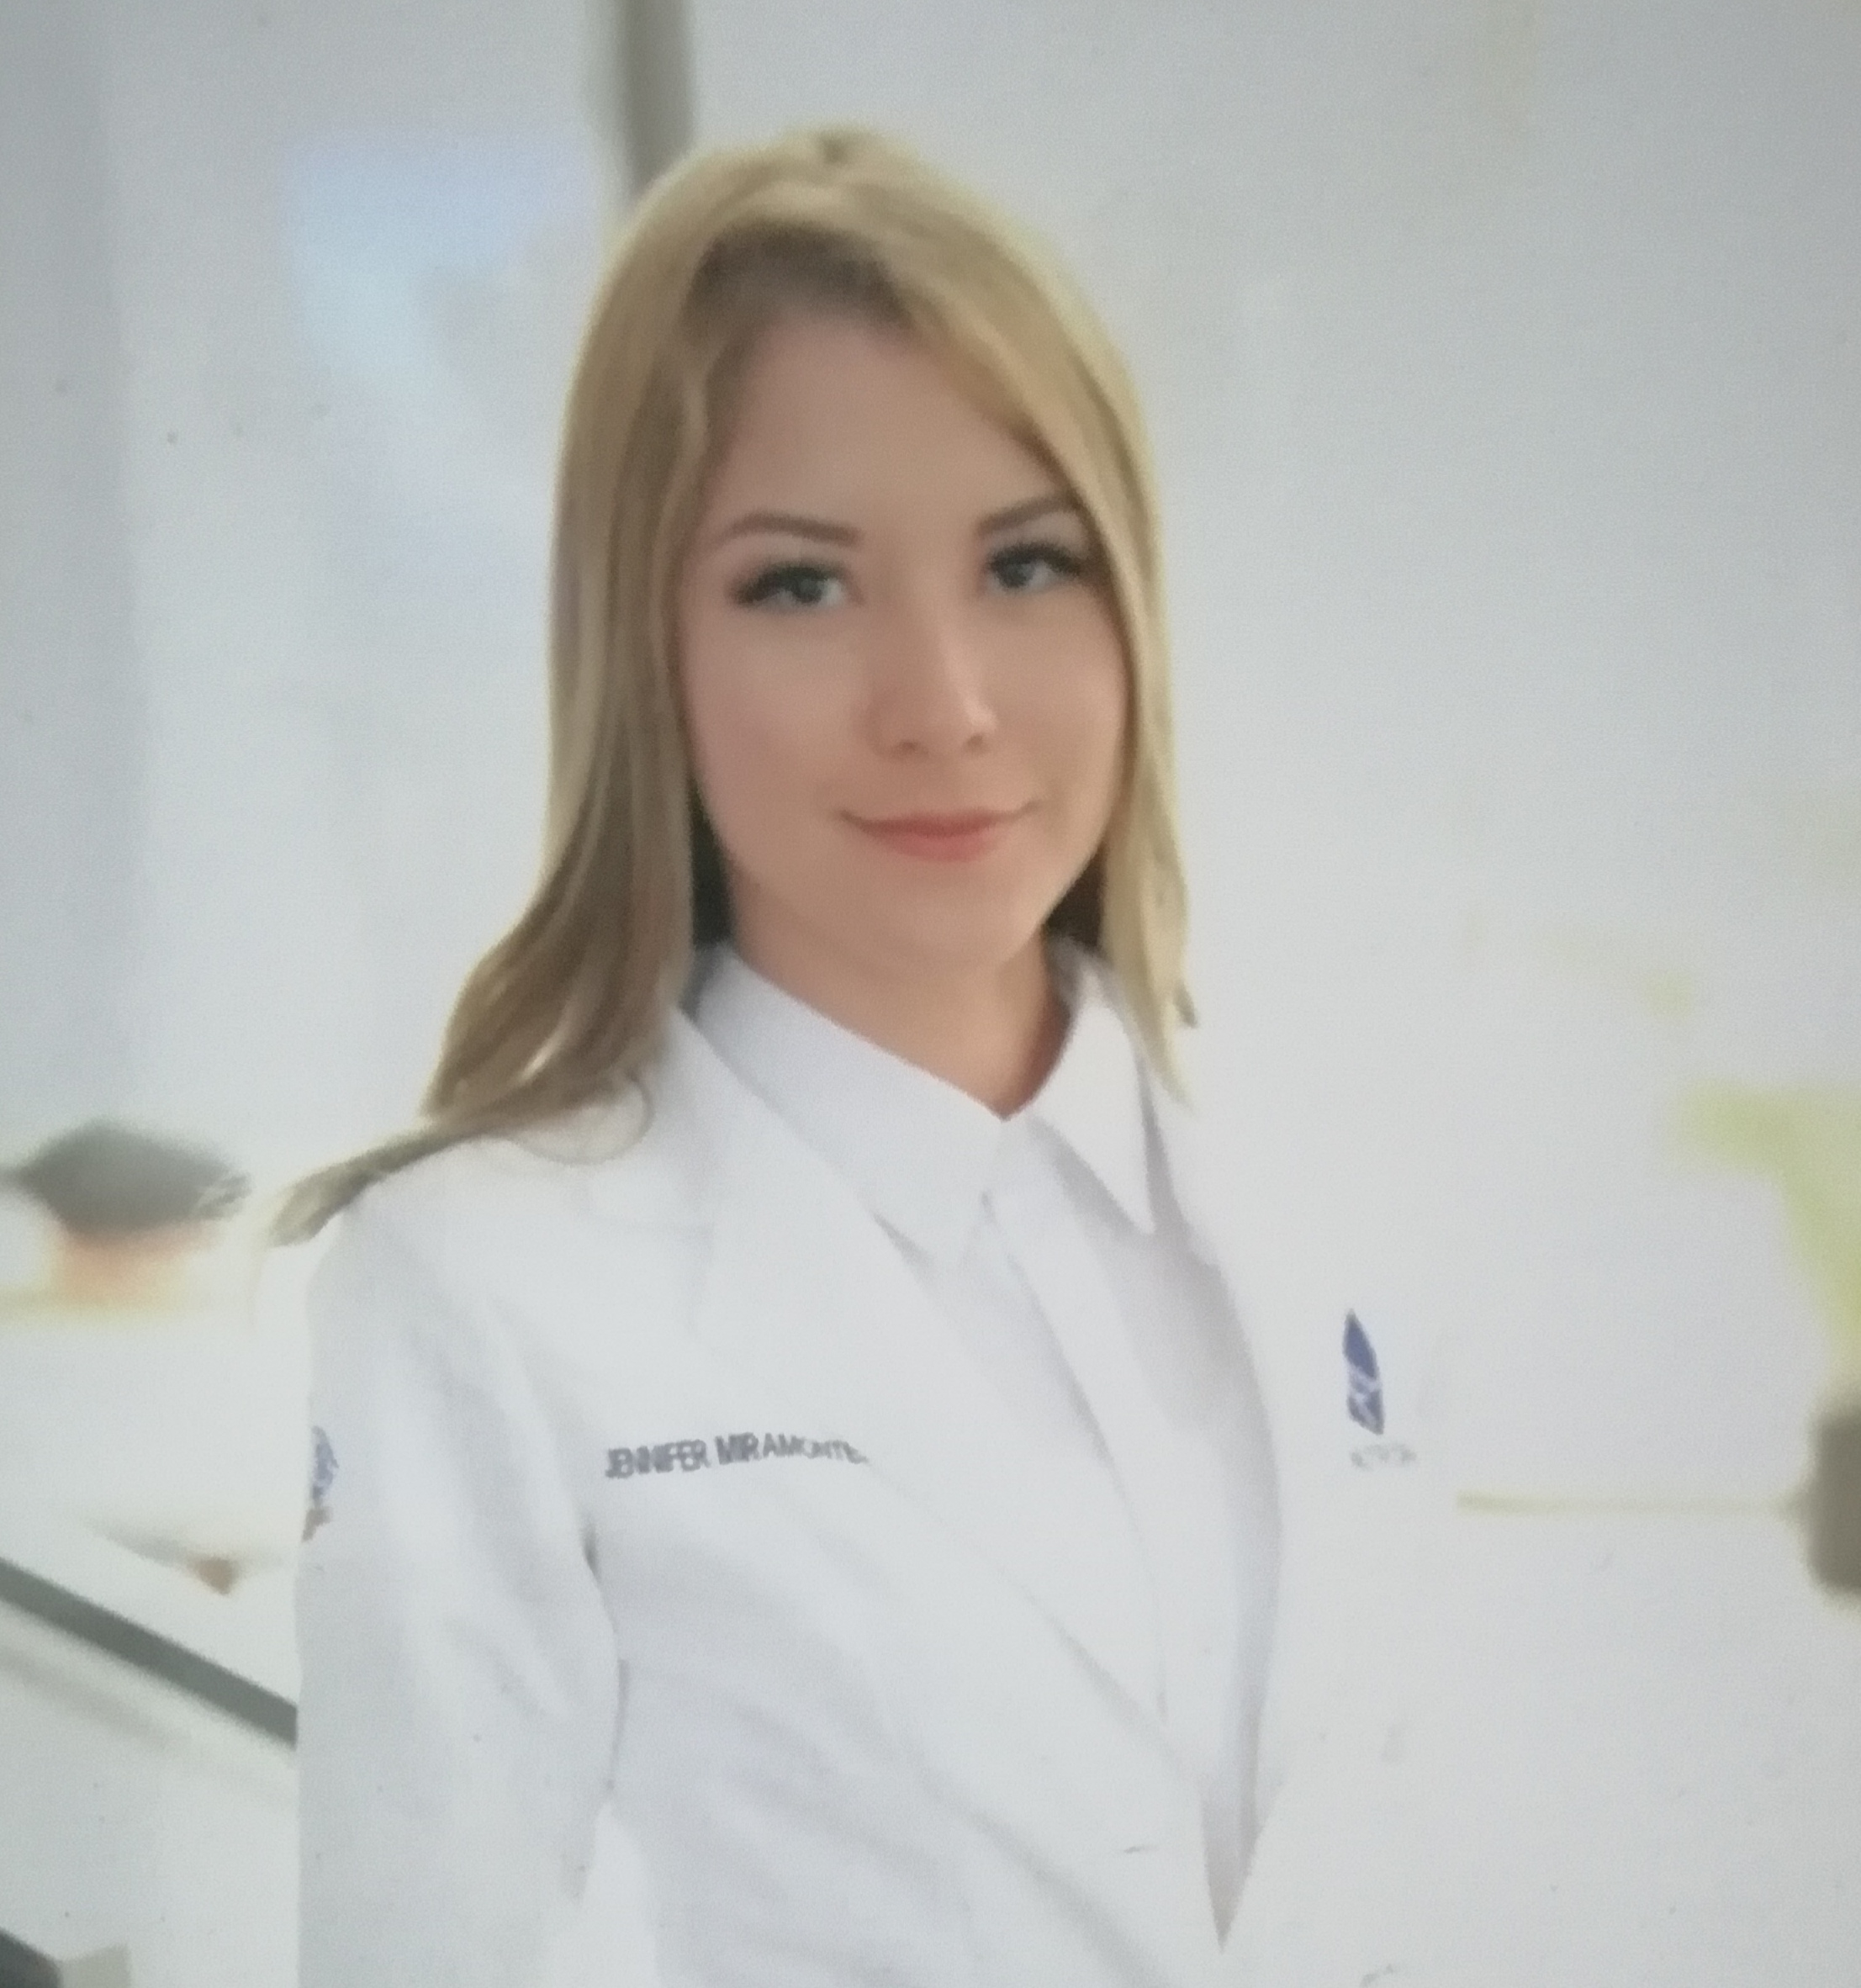 Jennifer   Miramontes Martínez